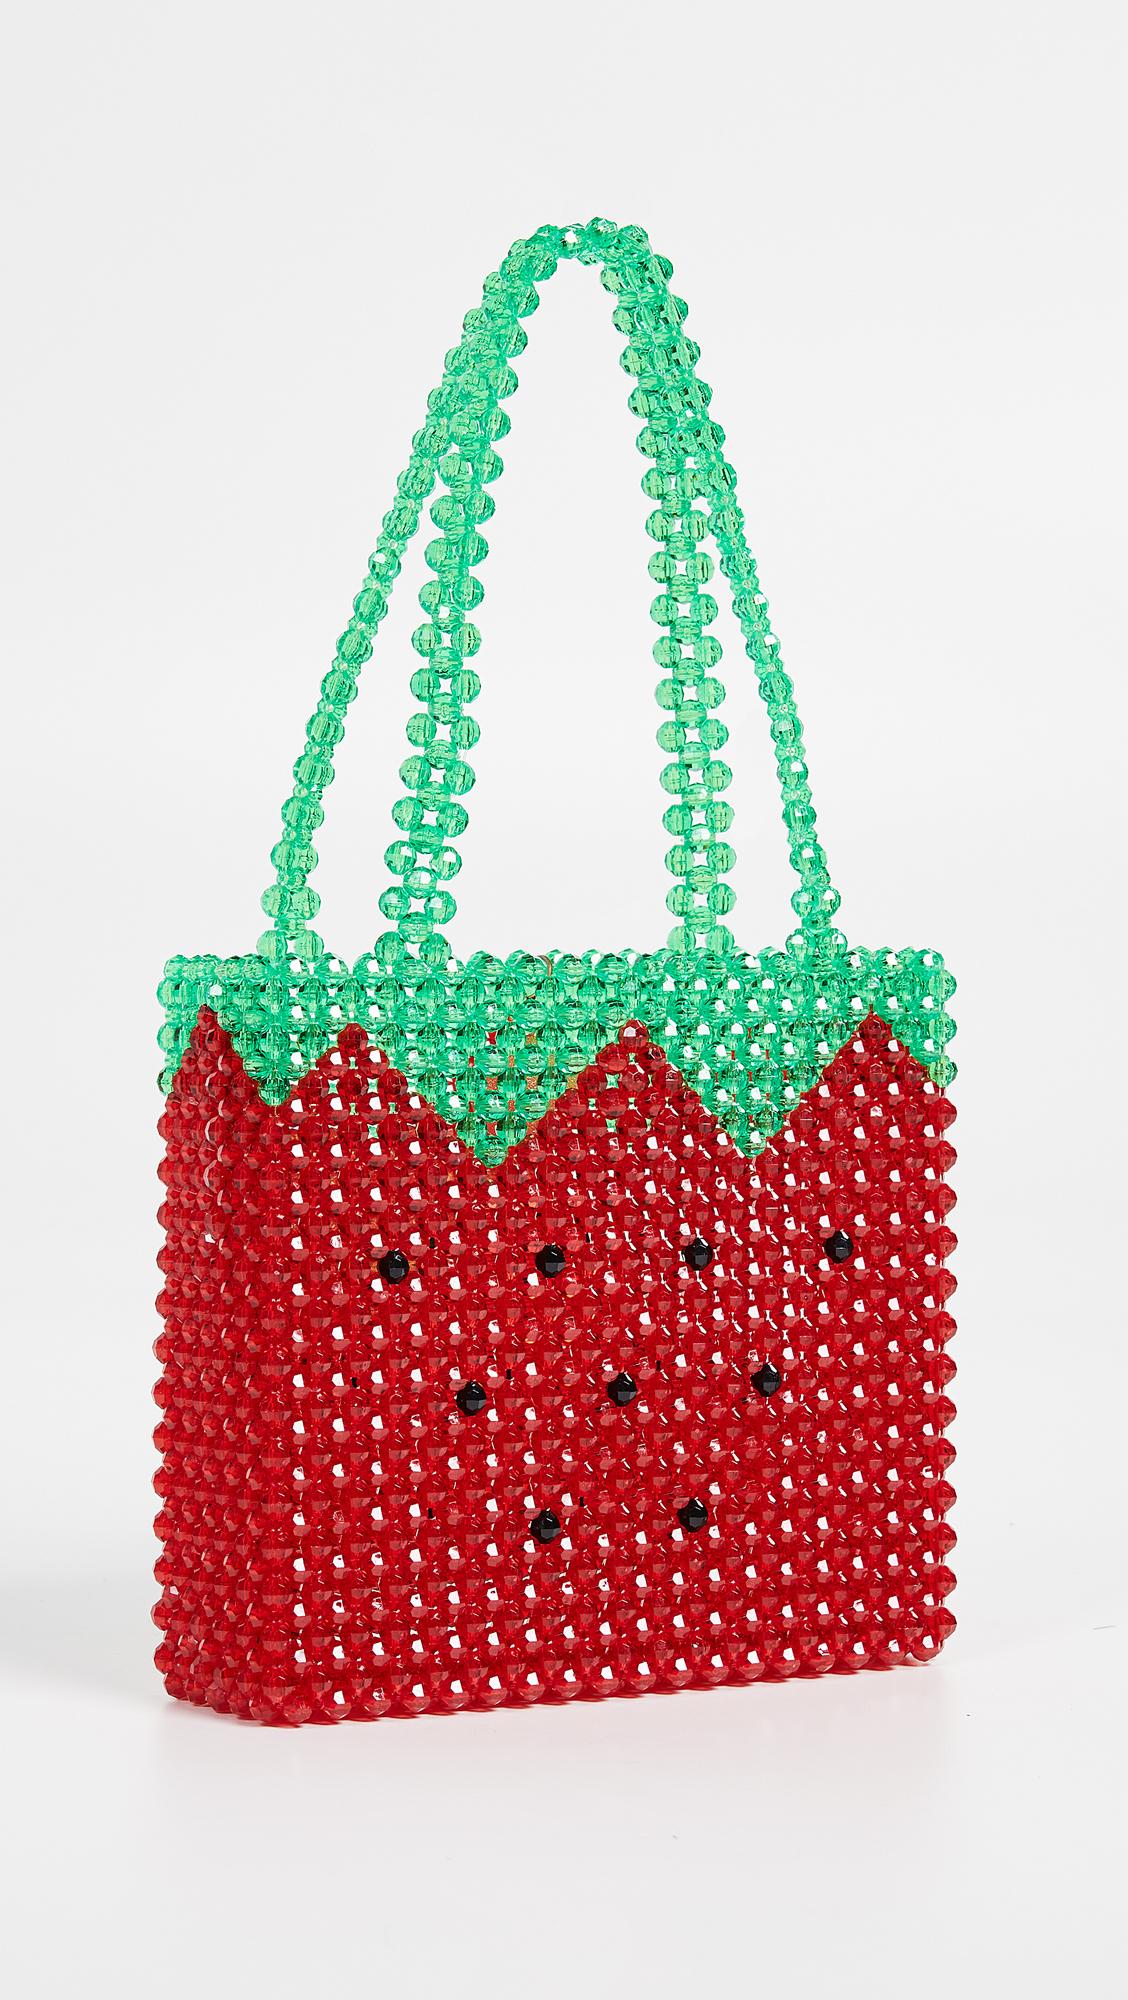 Super Cute Woven Beaded Bags by Susan Alexandra - Fresas Bag